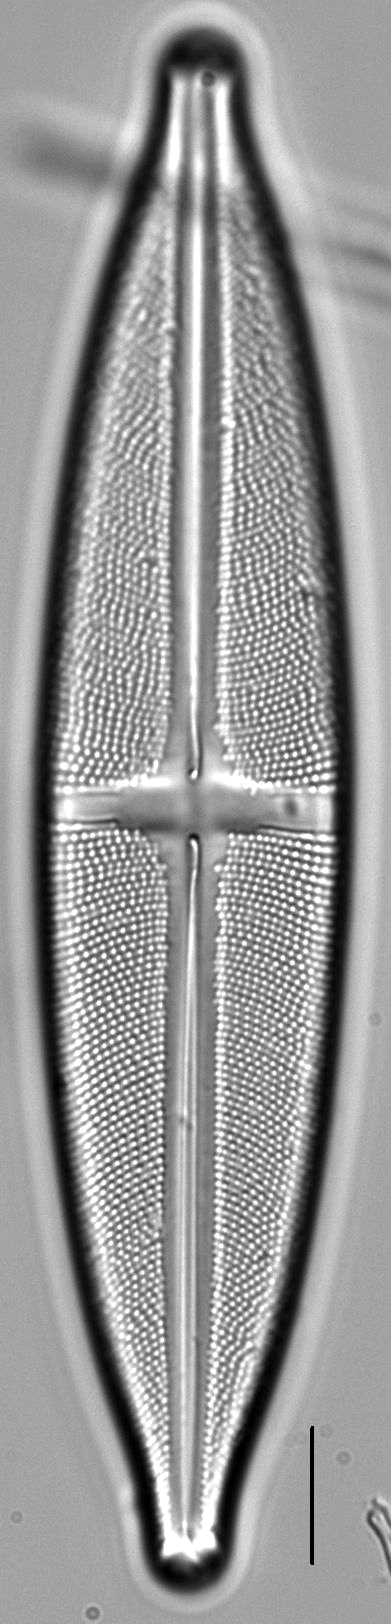 Stauroneis superkuelbsii LM4